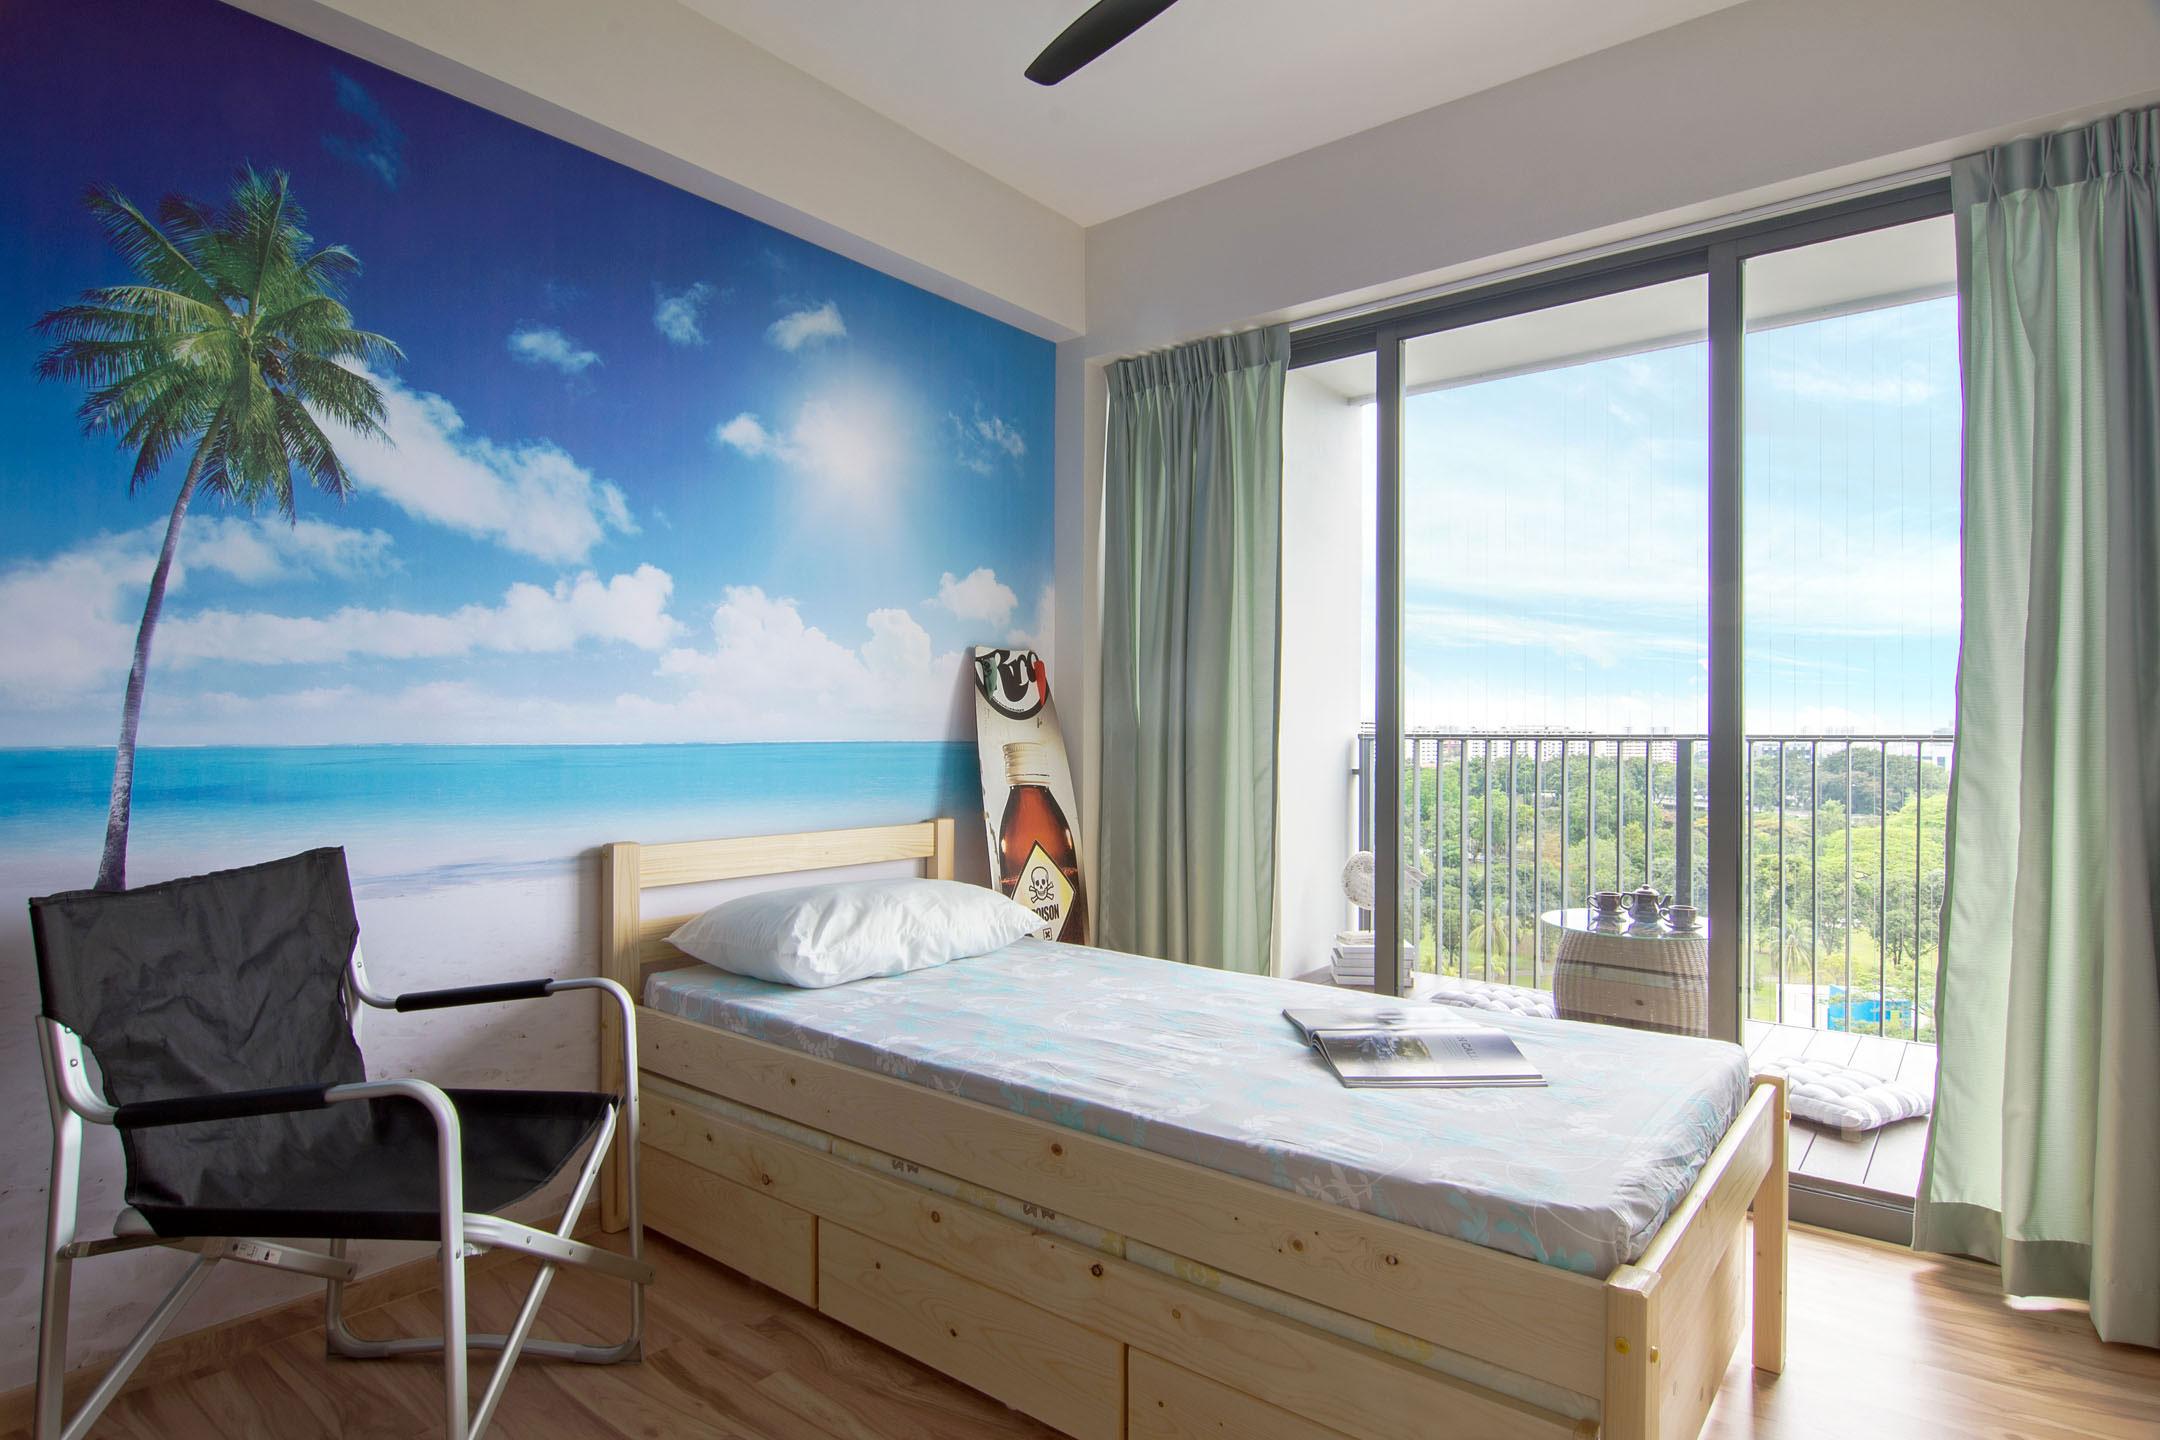 Beach house urban apartment in Singapore by Vievva Designers-12